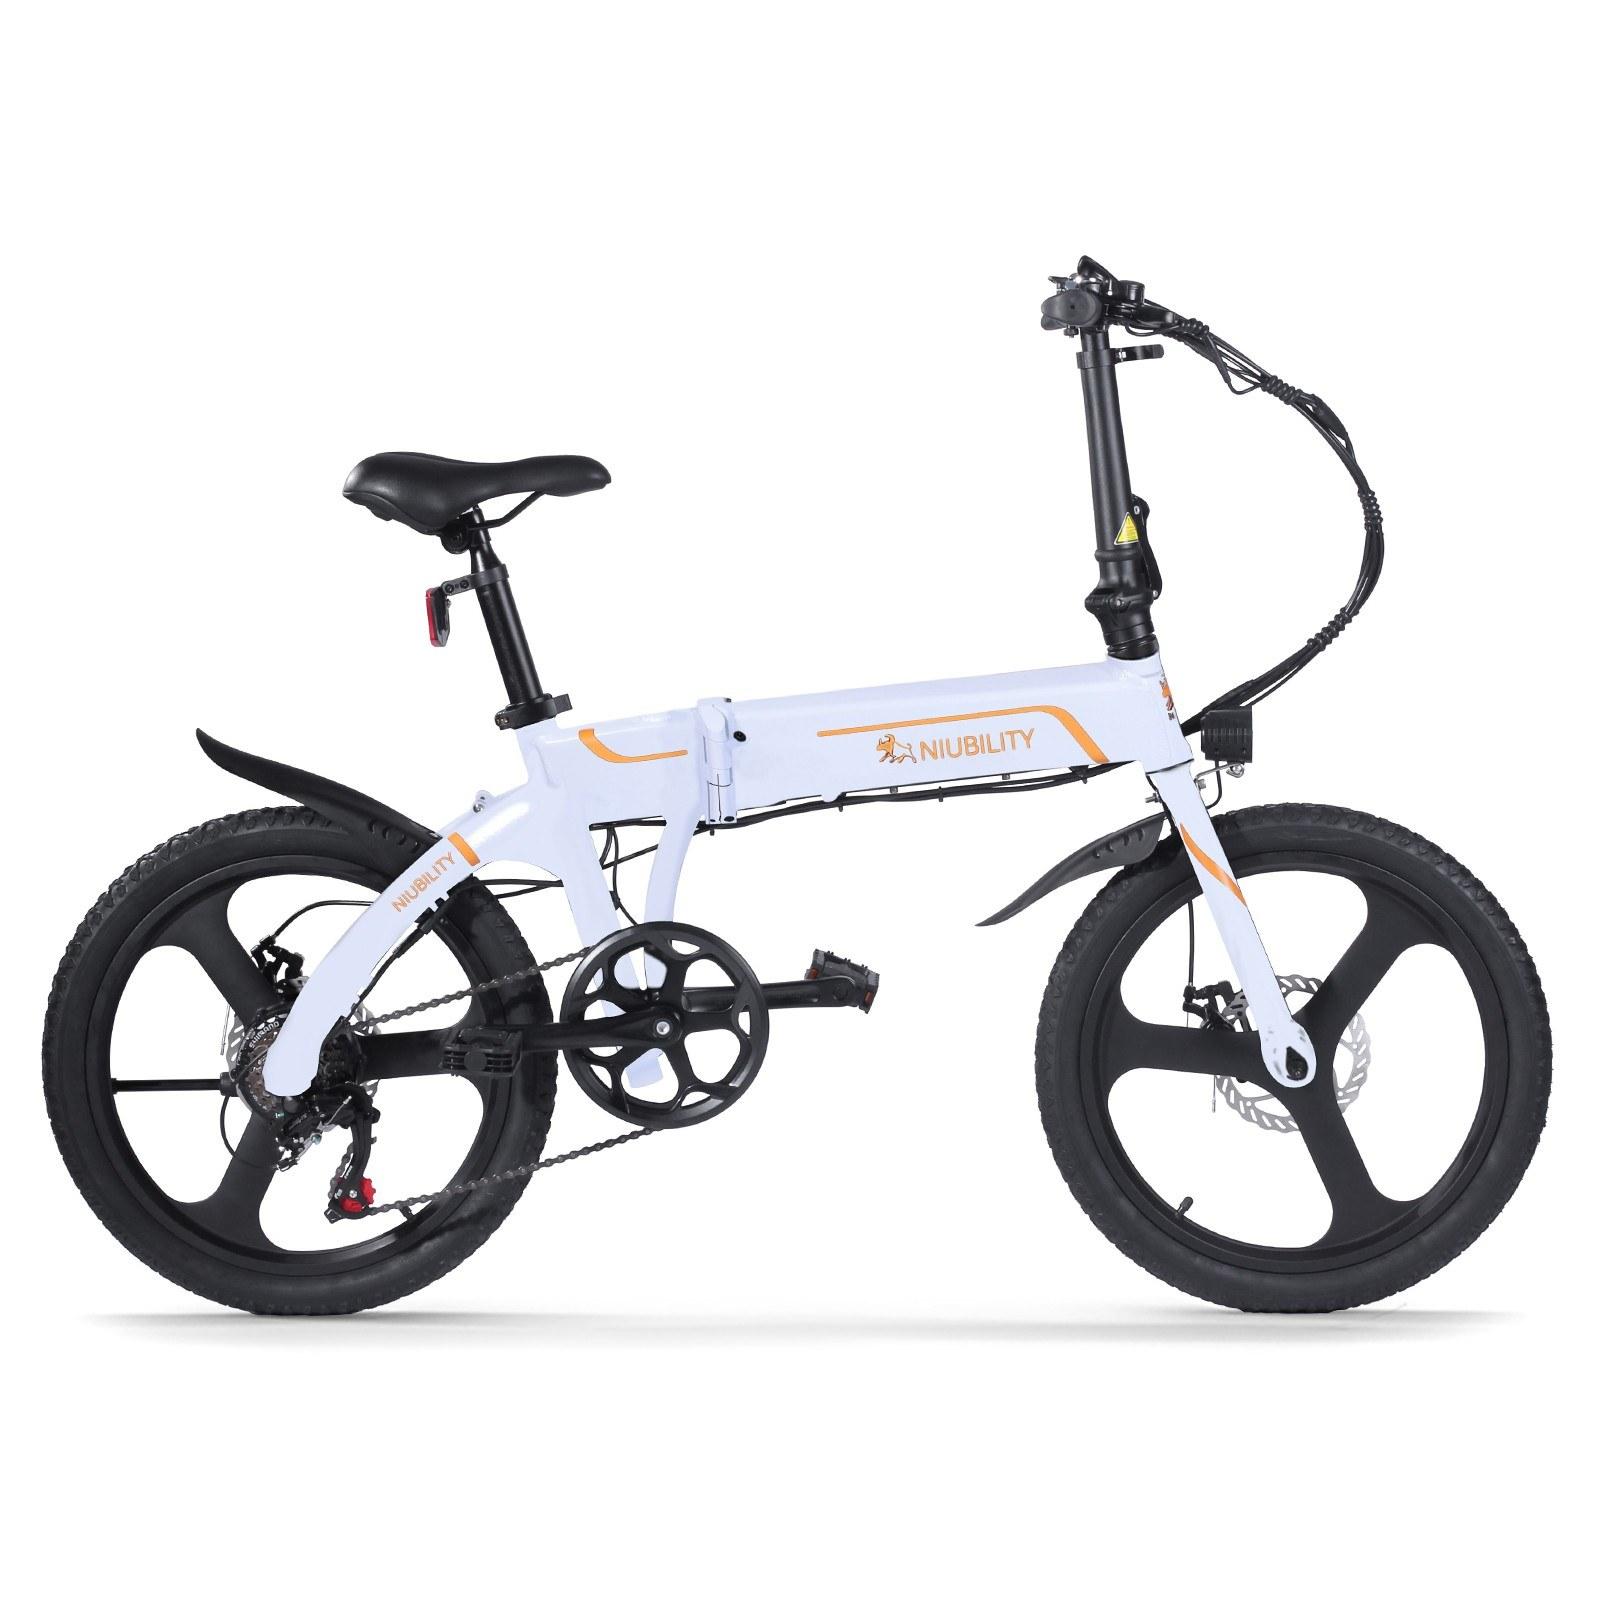 tomtop.com - [EU Warehouse]$270 OFF Niubility B20 20 Inch Folding Electric Bicycle 350W 40-50km Range, $759.99 Inclusive of VAT